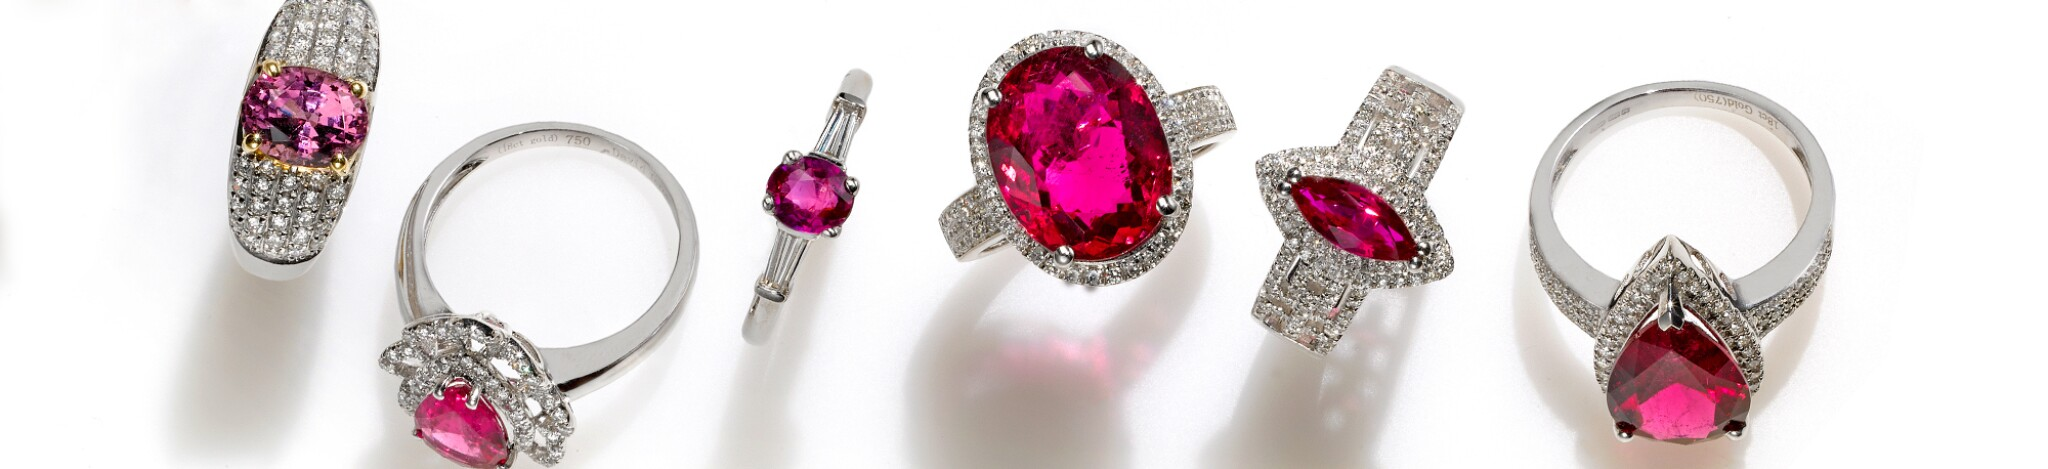 Jewels Online: The Red Gem Edit